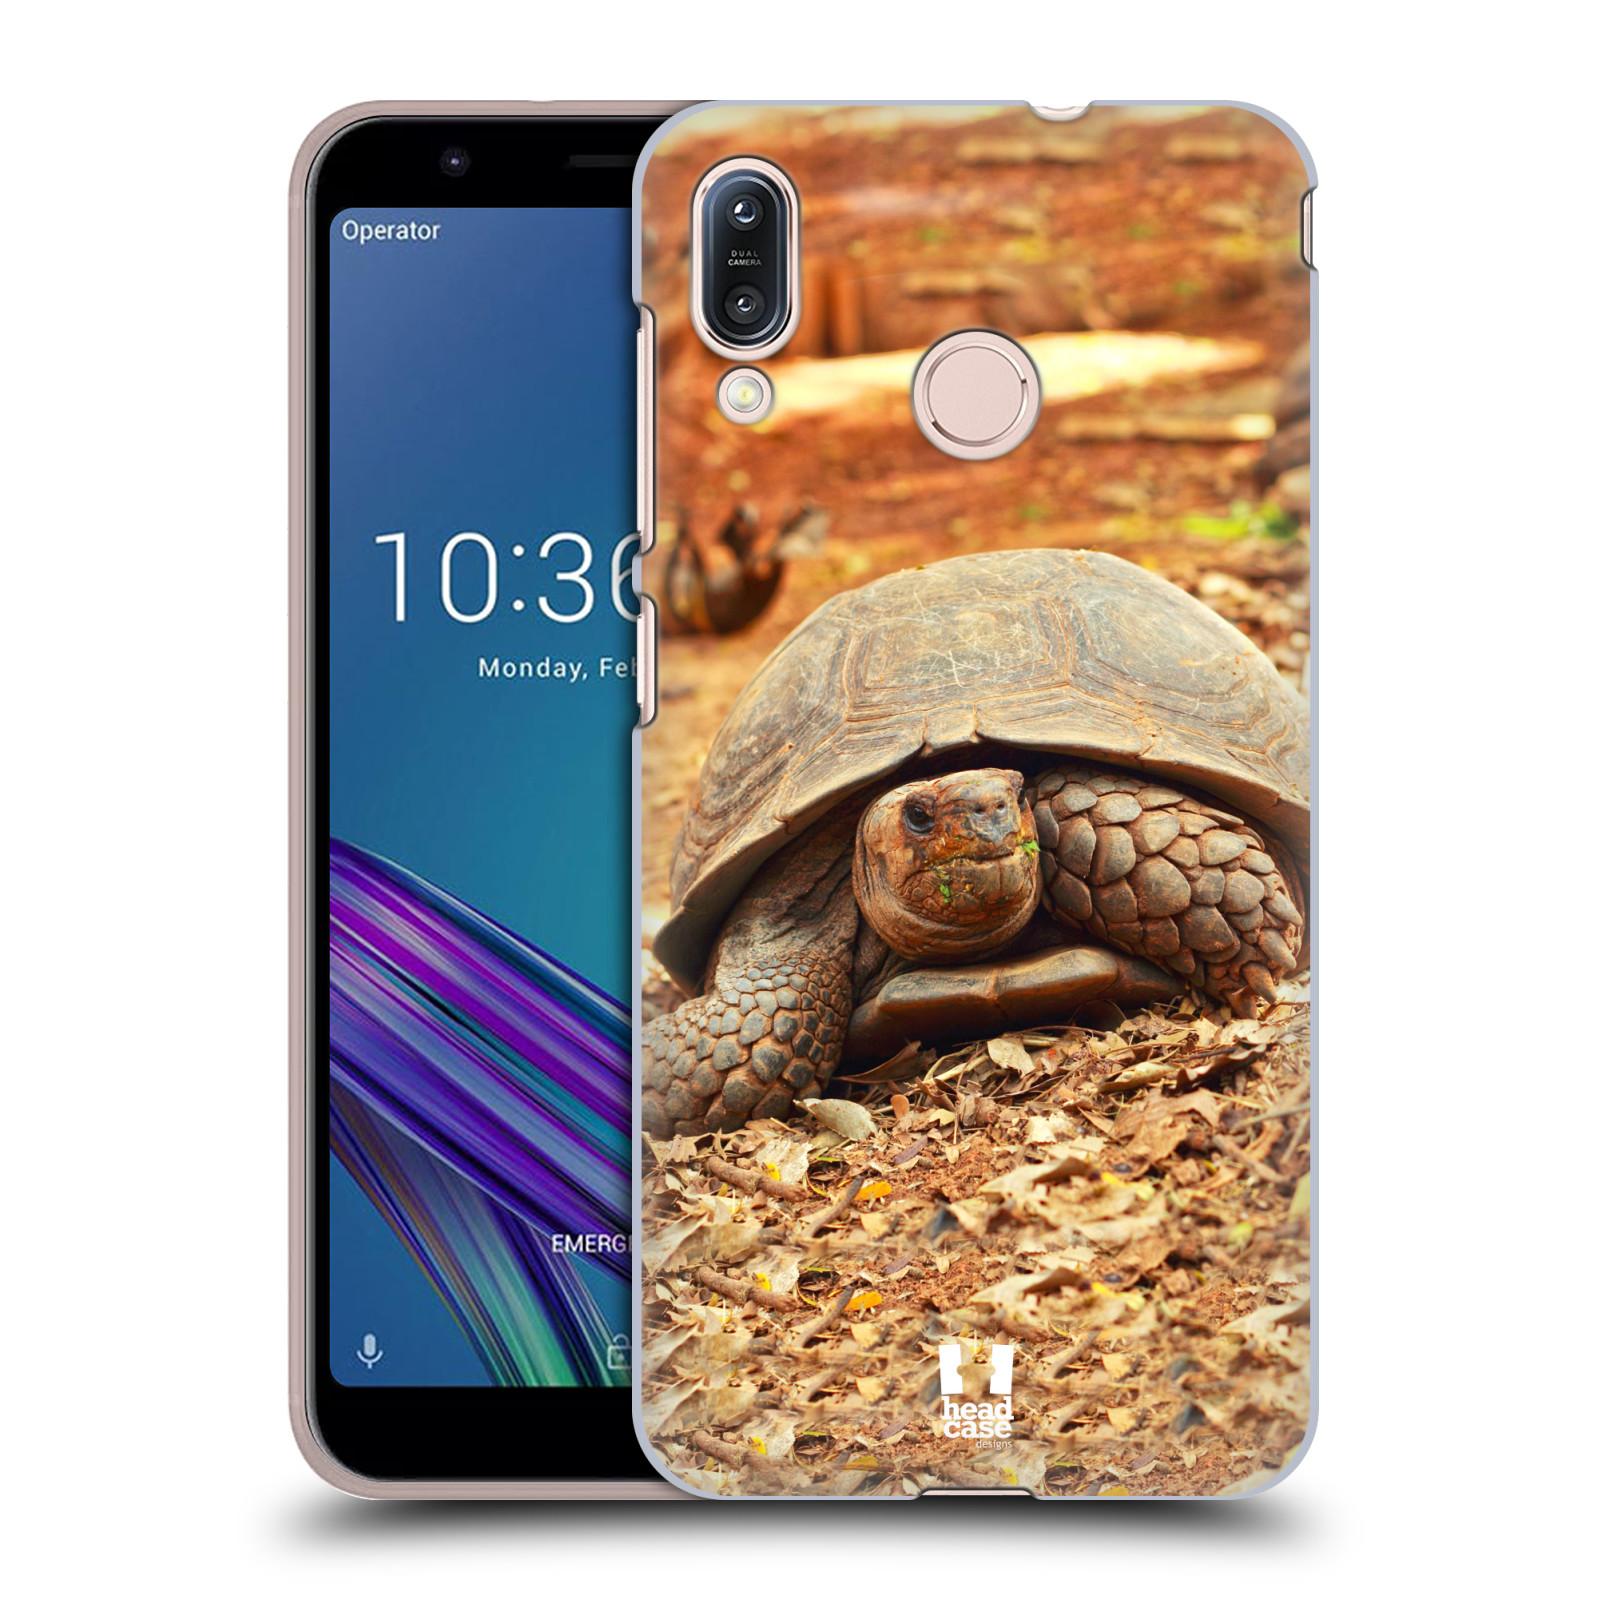 Pouzdro na mobil Asus Zenfone Max M1 (ZB555KL) - HEAD CASE - vzor slavná zvířata foto želva